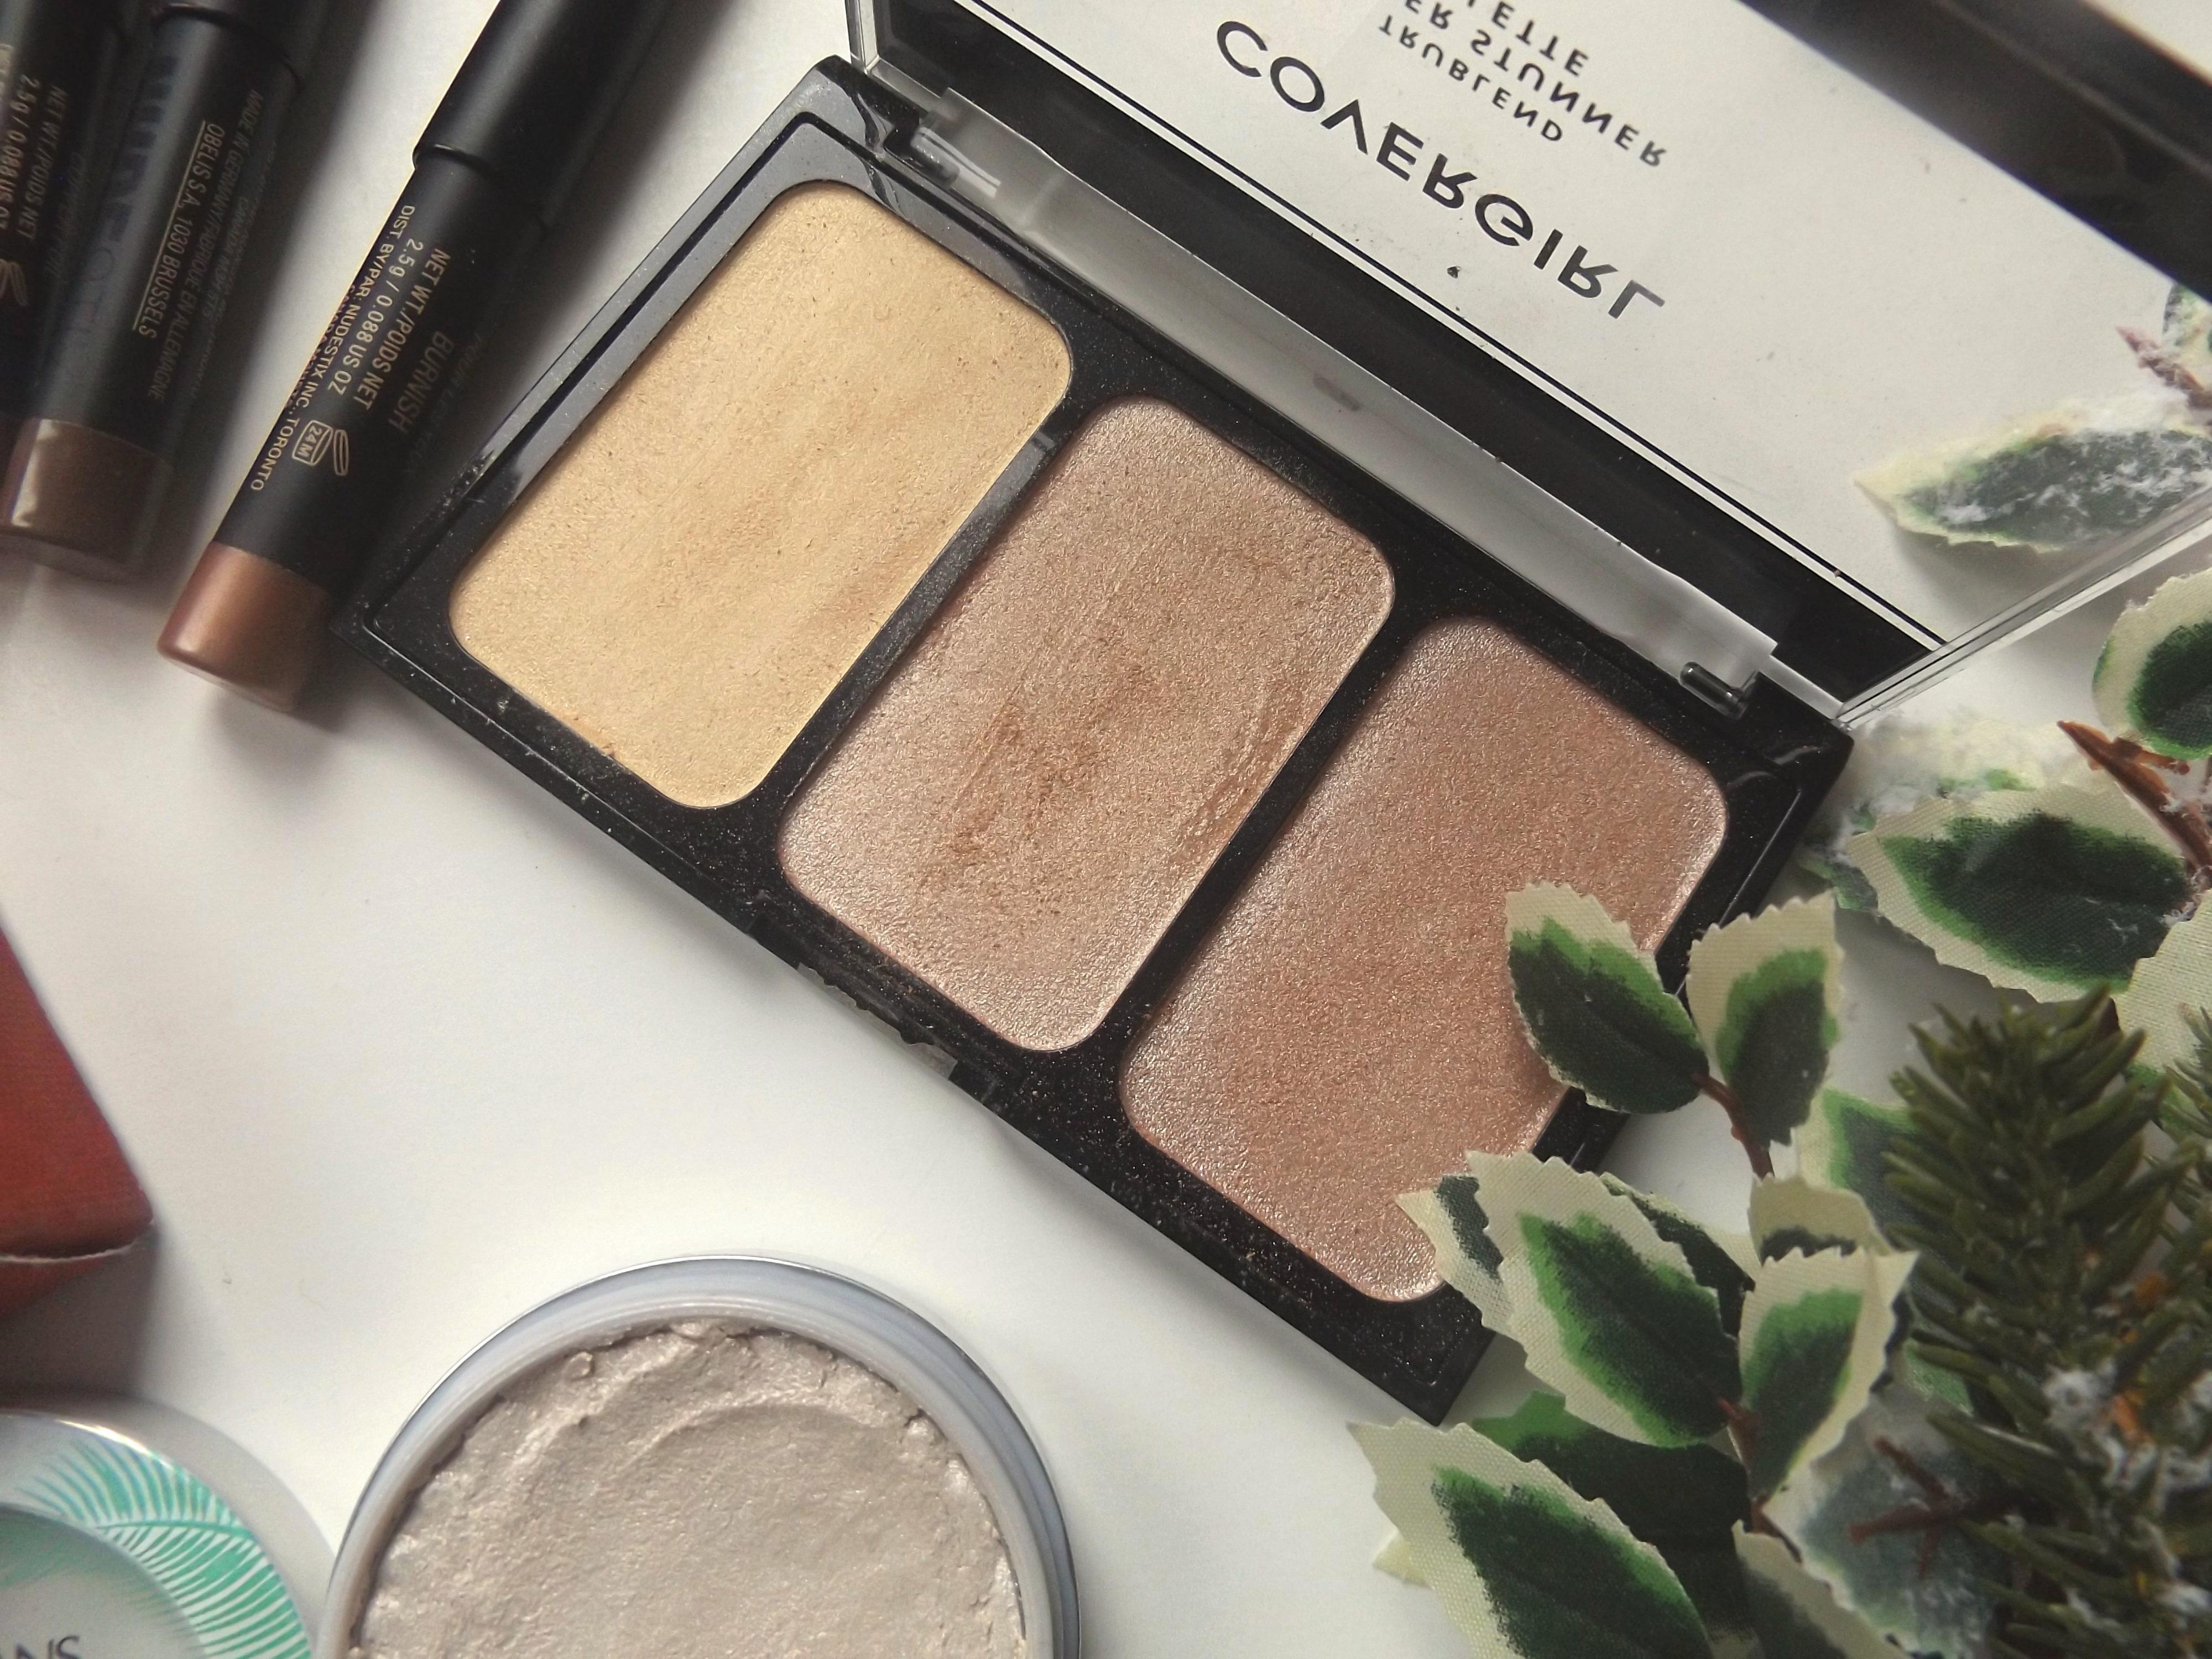 Covergirl Palette - open